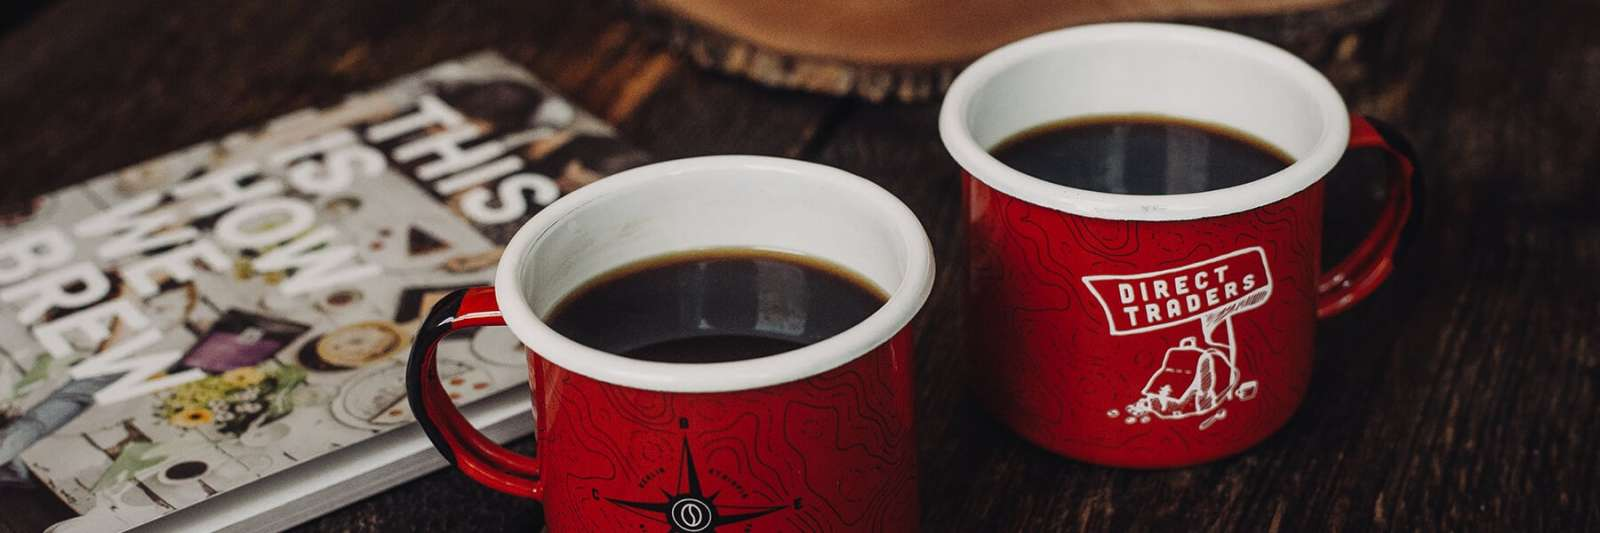 Lieblingskaffee-Abo